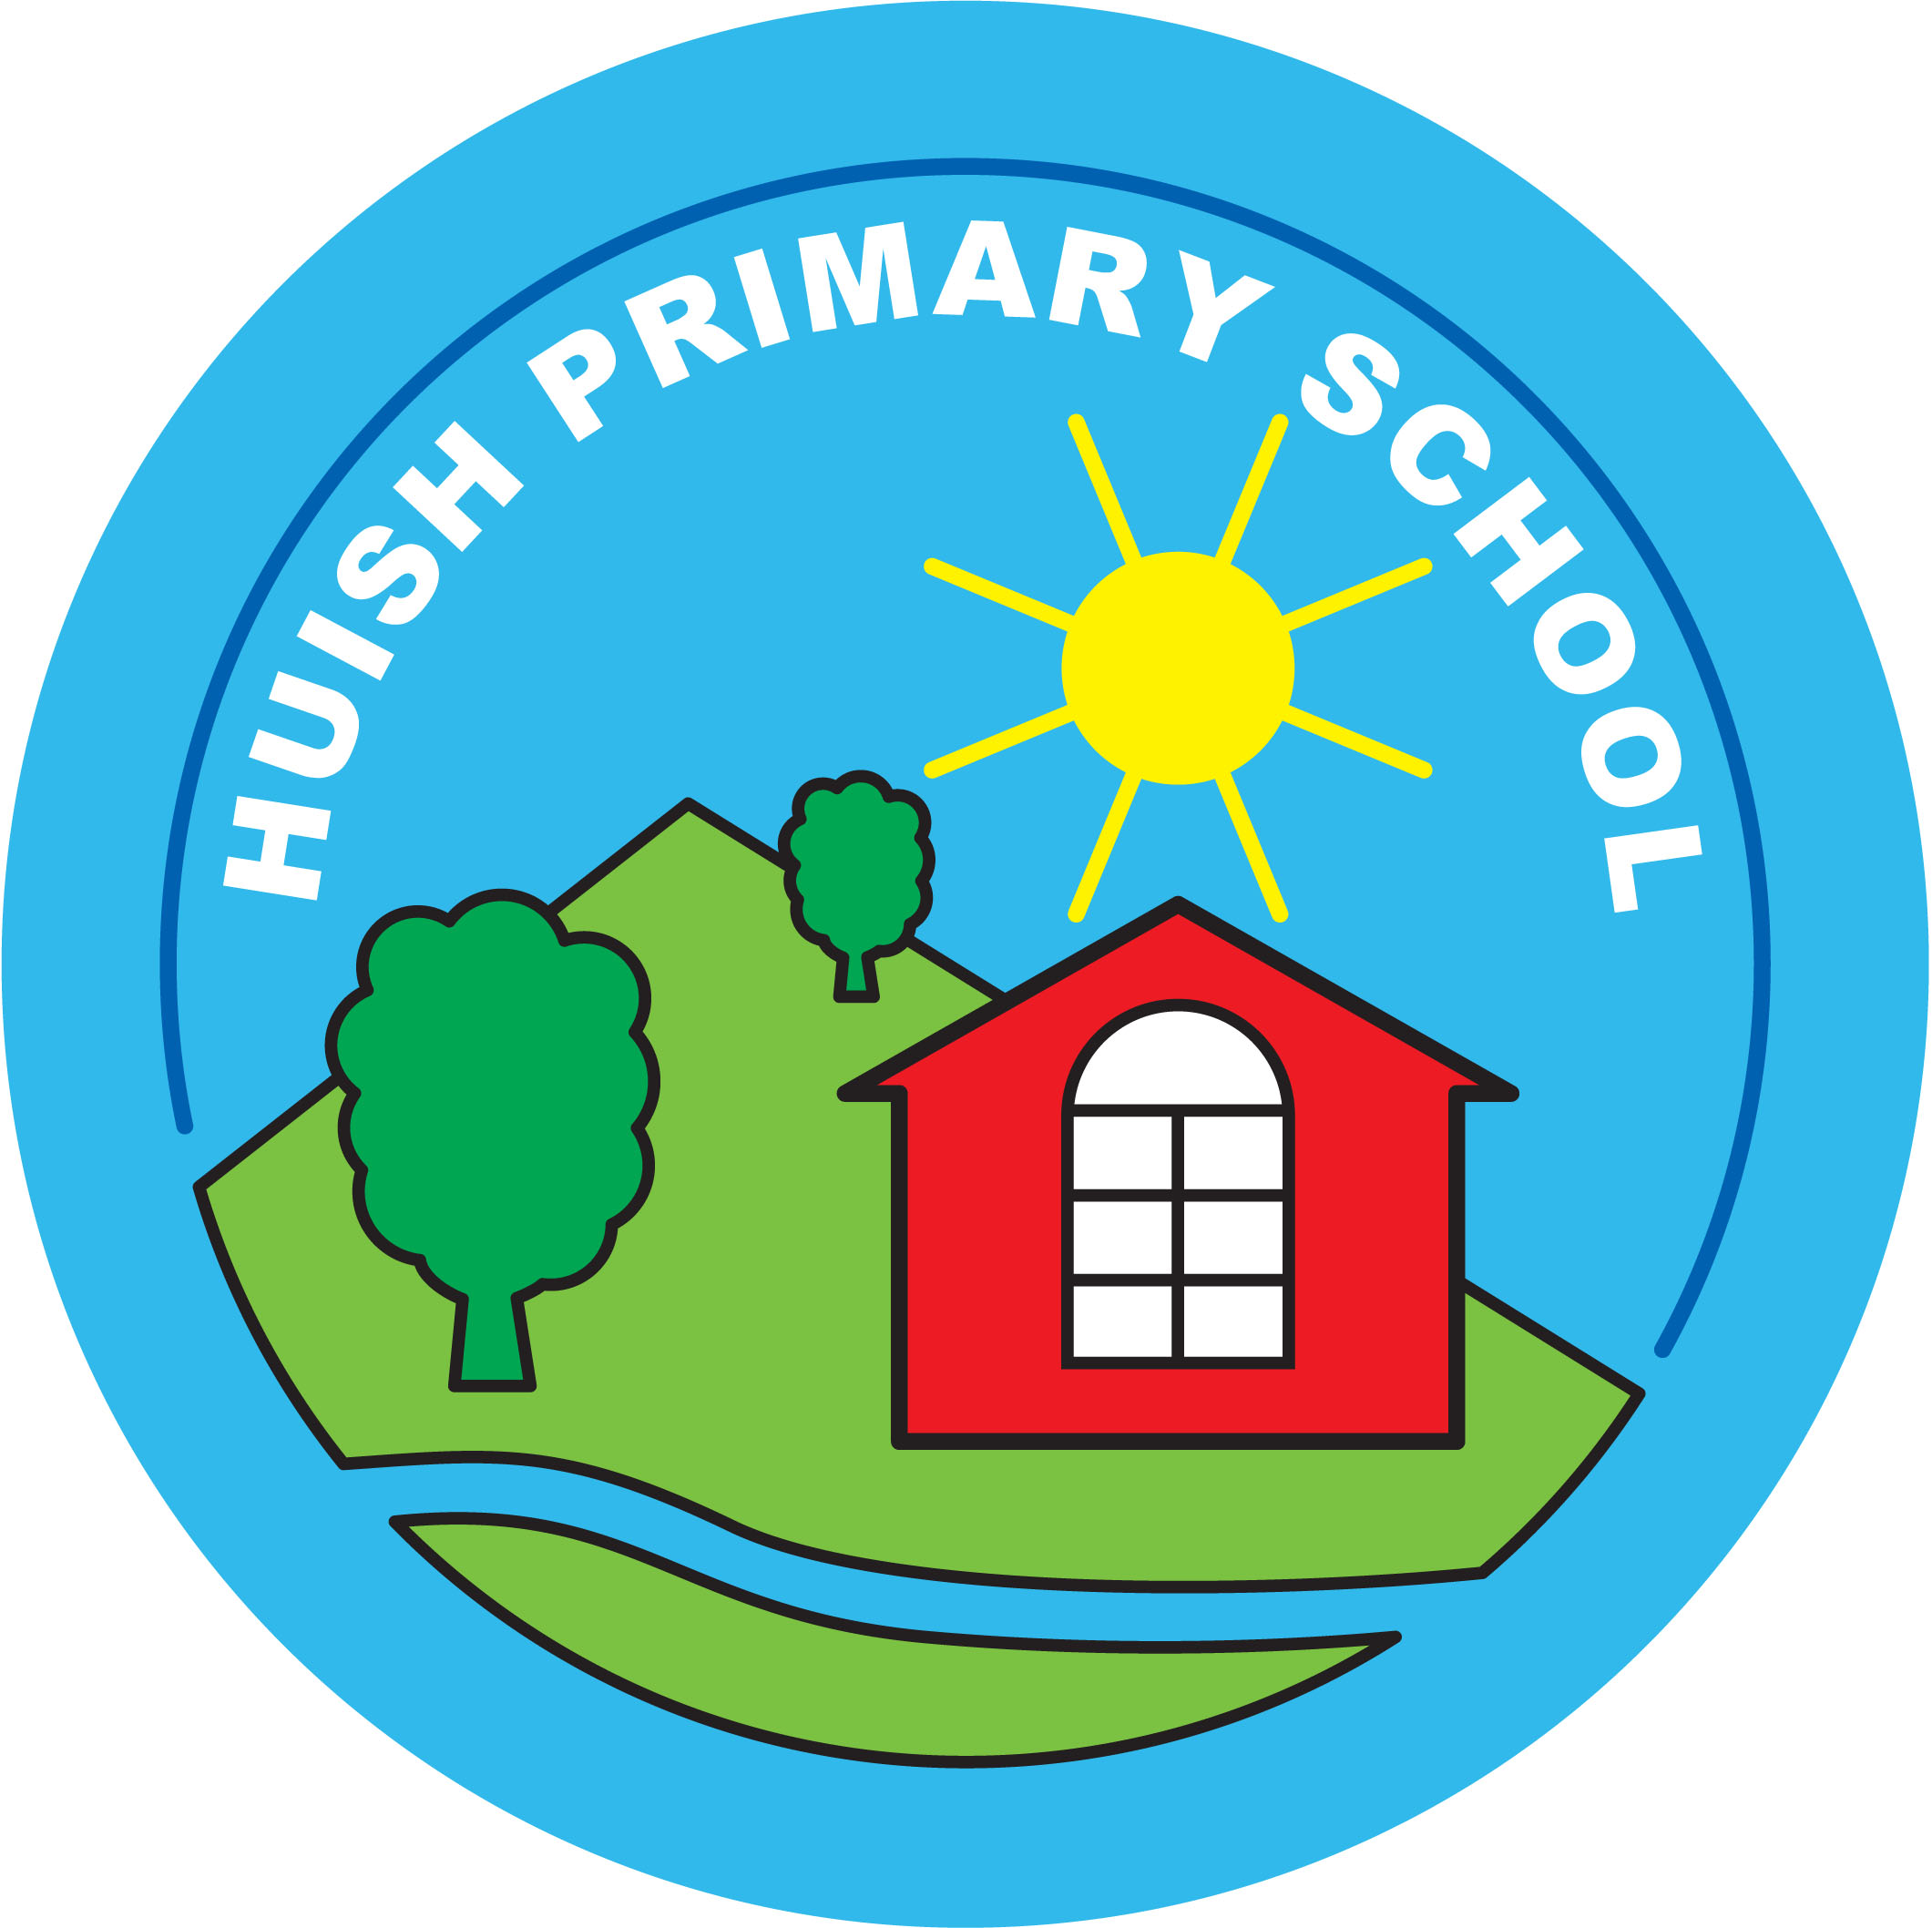 Huish Primary School